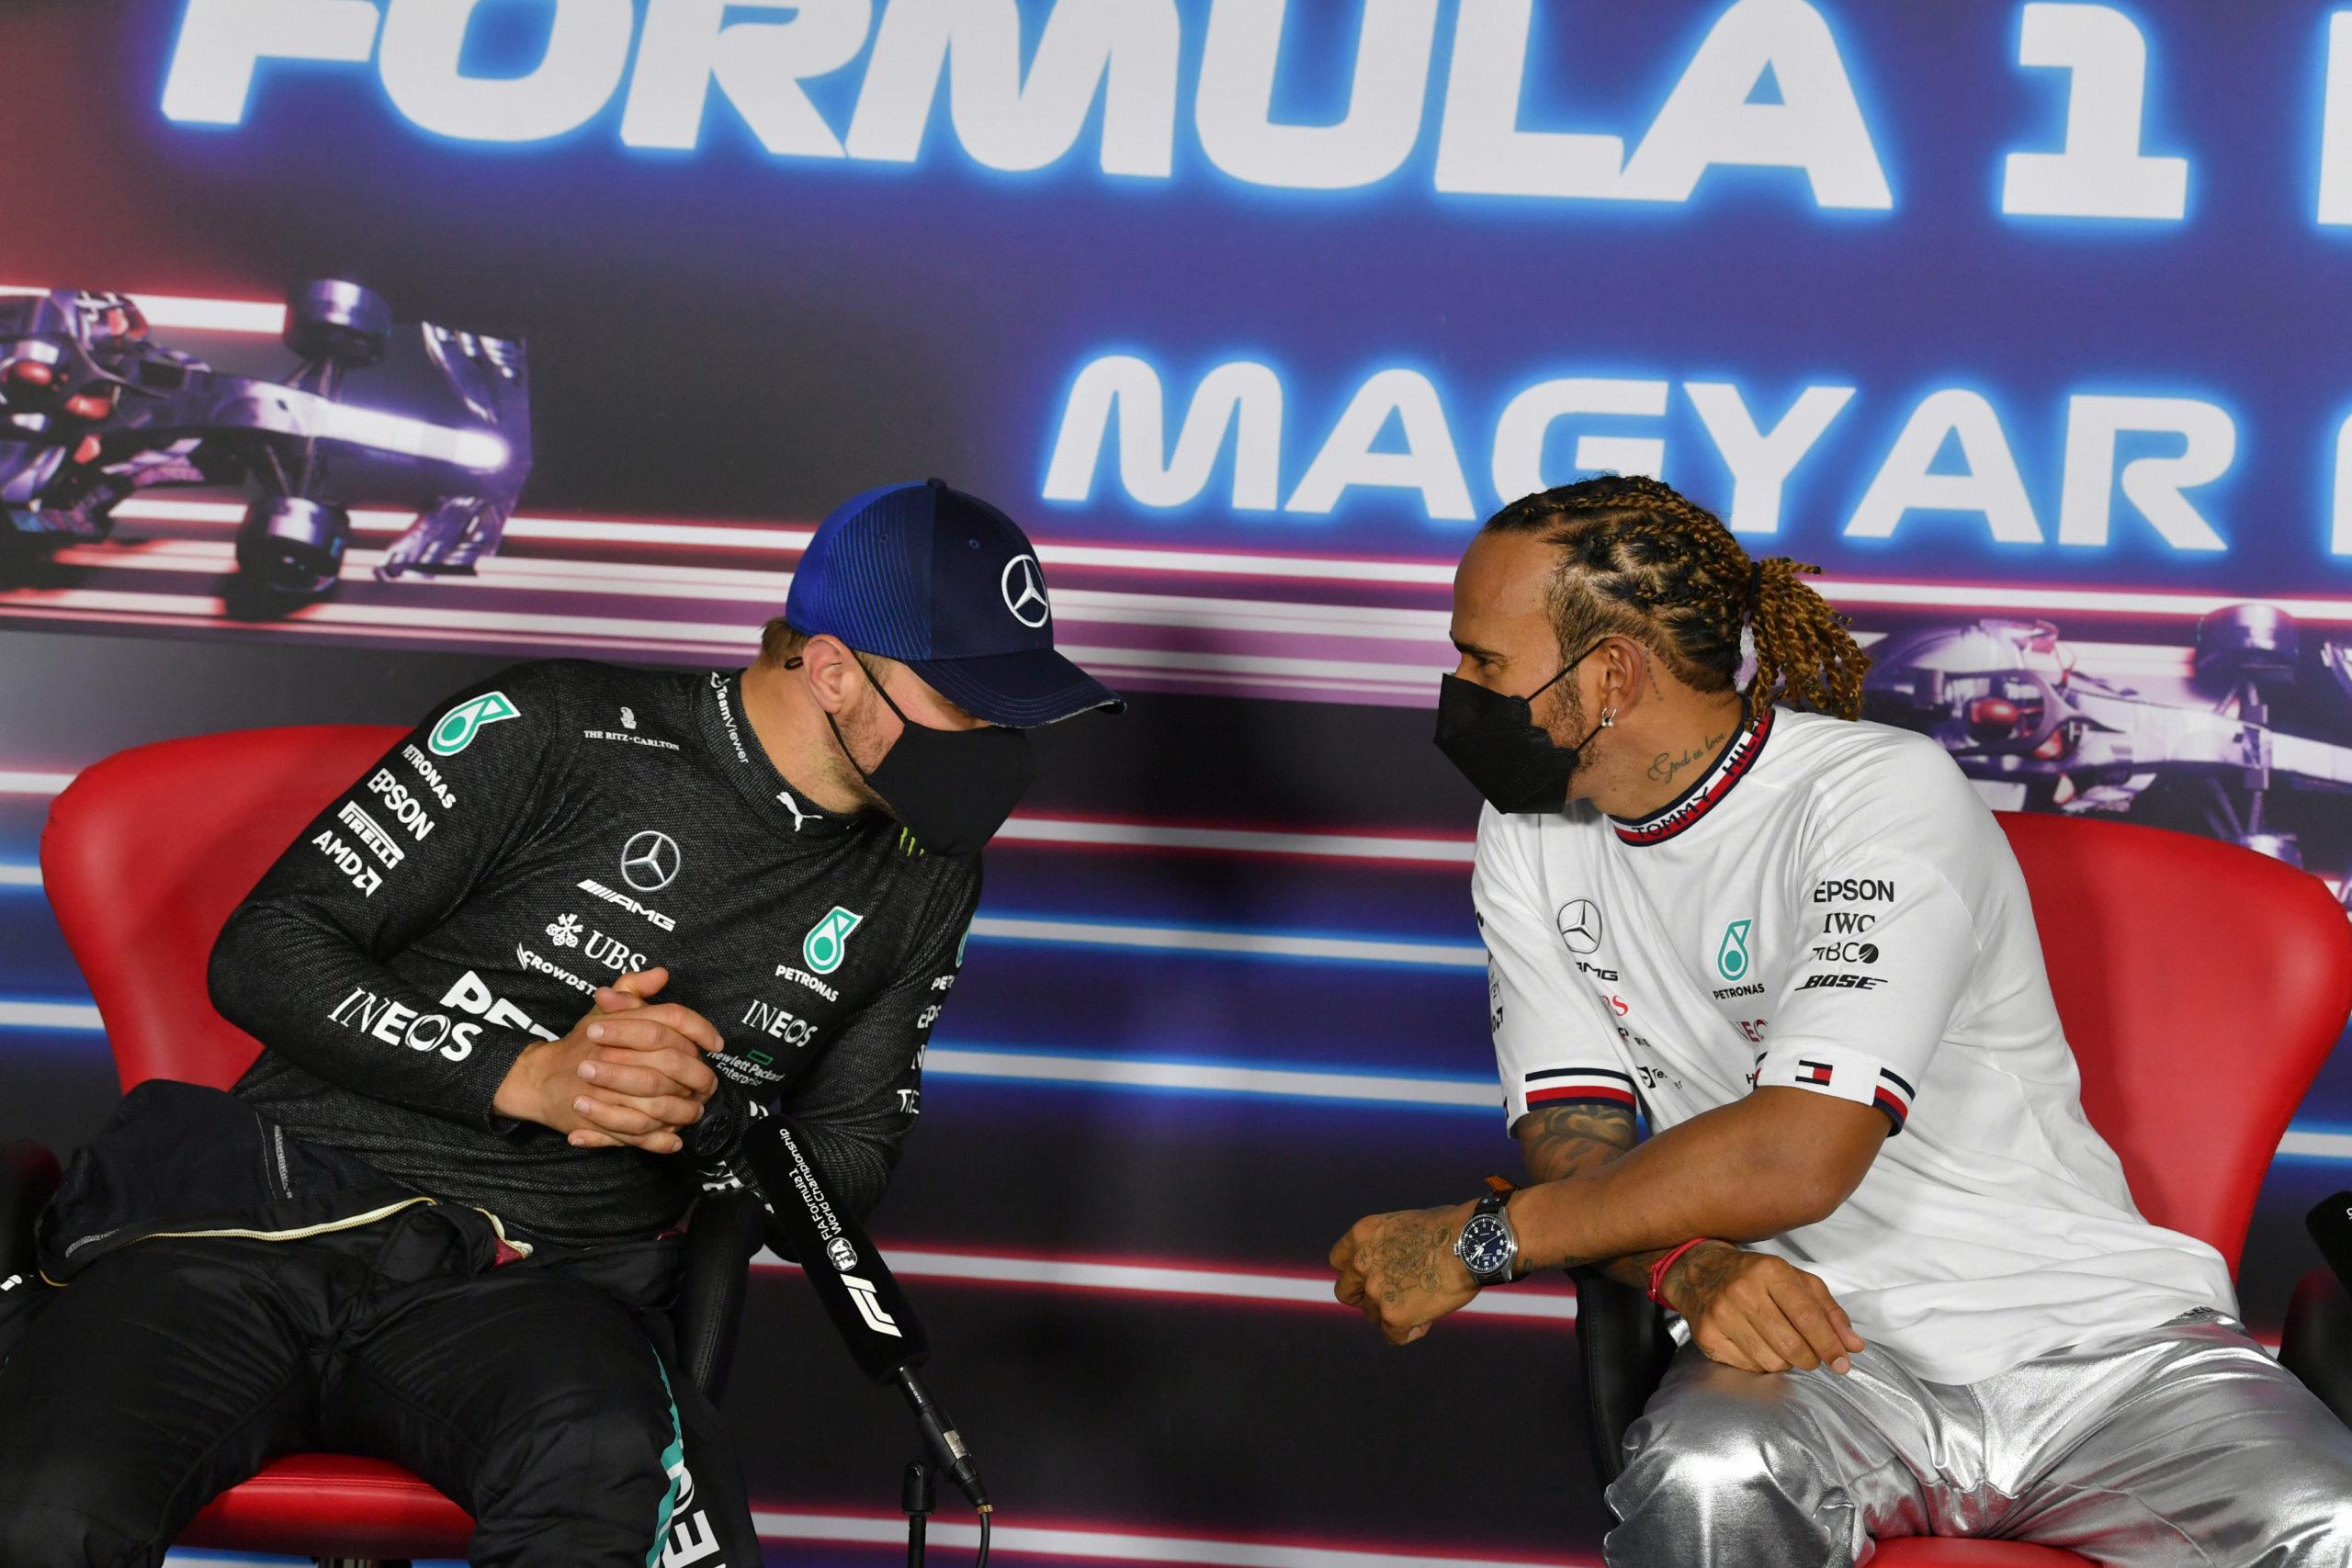 Lewis Hamilton and Valtteri Bottas, Mercedes, 2021 Hungarian Grand Prix, Saturday - LAT Images